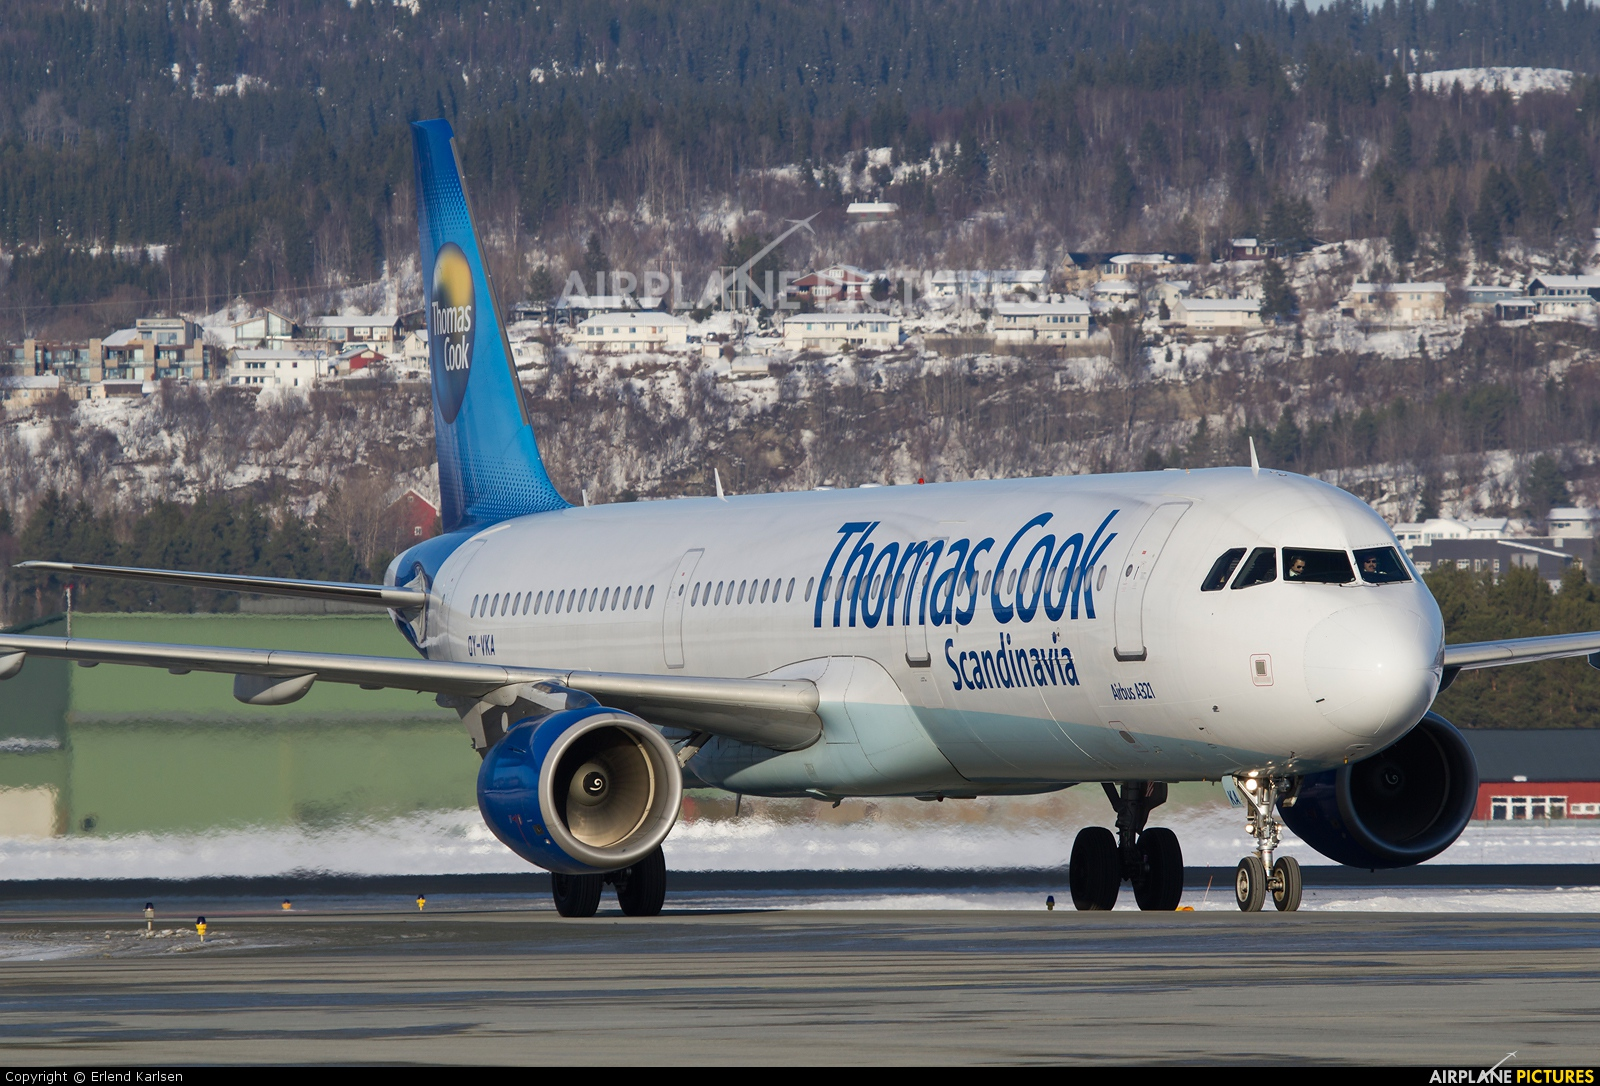 Thomas Cook Scandinavia OY-VKA aircraft at Trondheim - Vaernes